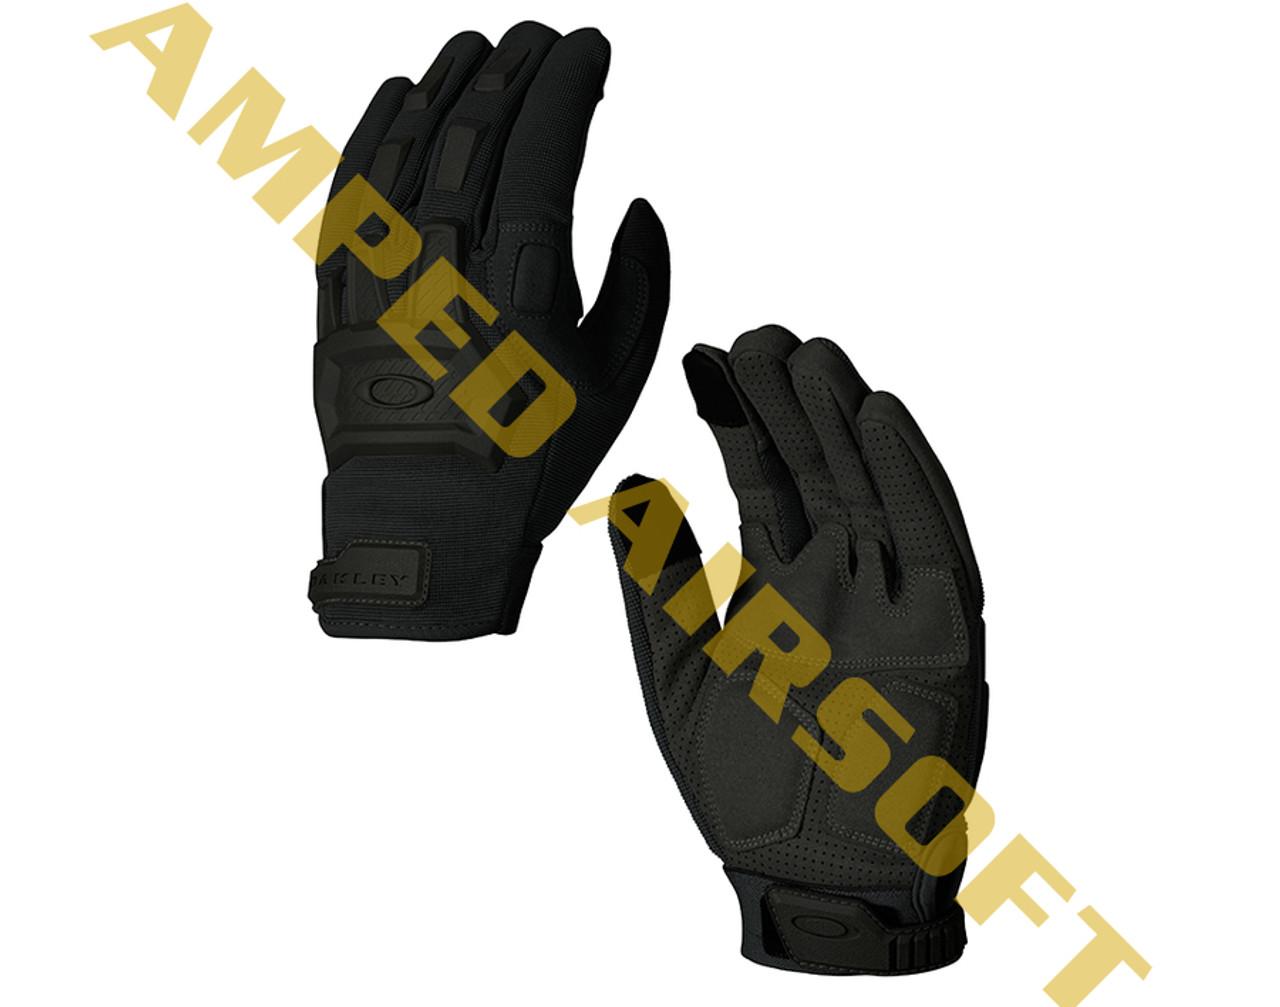 7bf6c0b126f Oakley - SI Flexion Glove - Black - Small